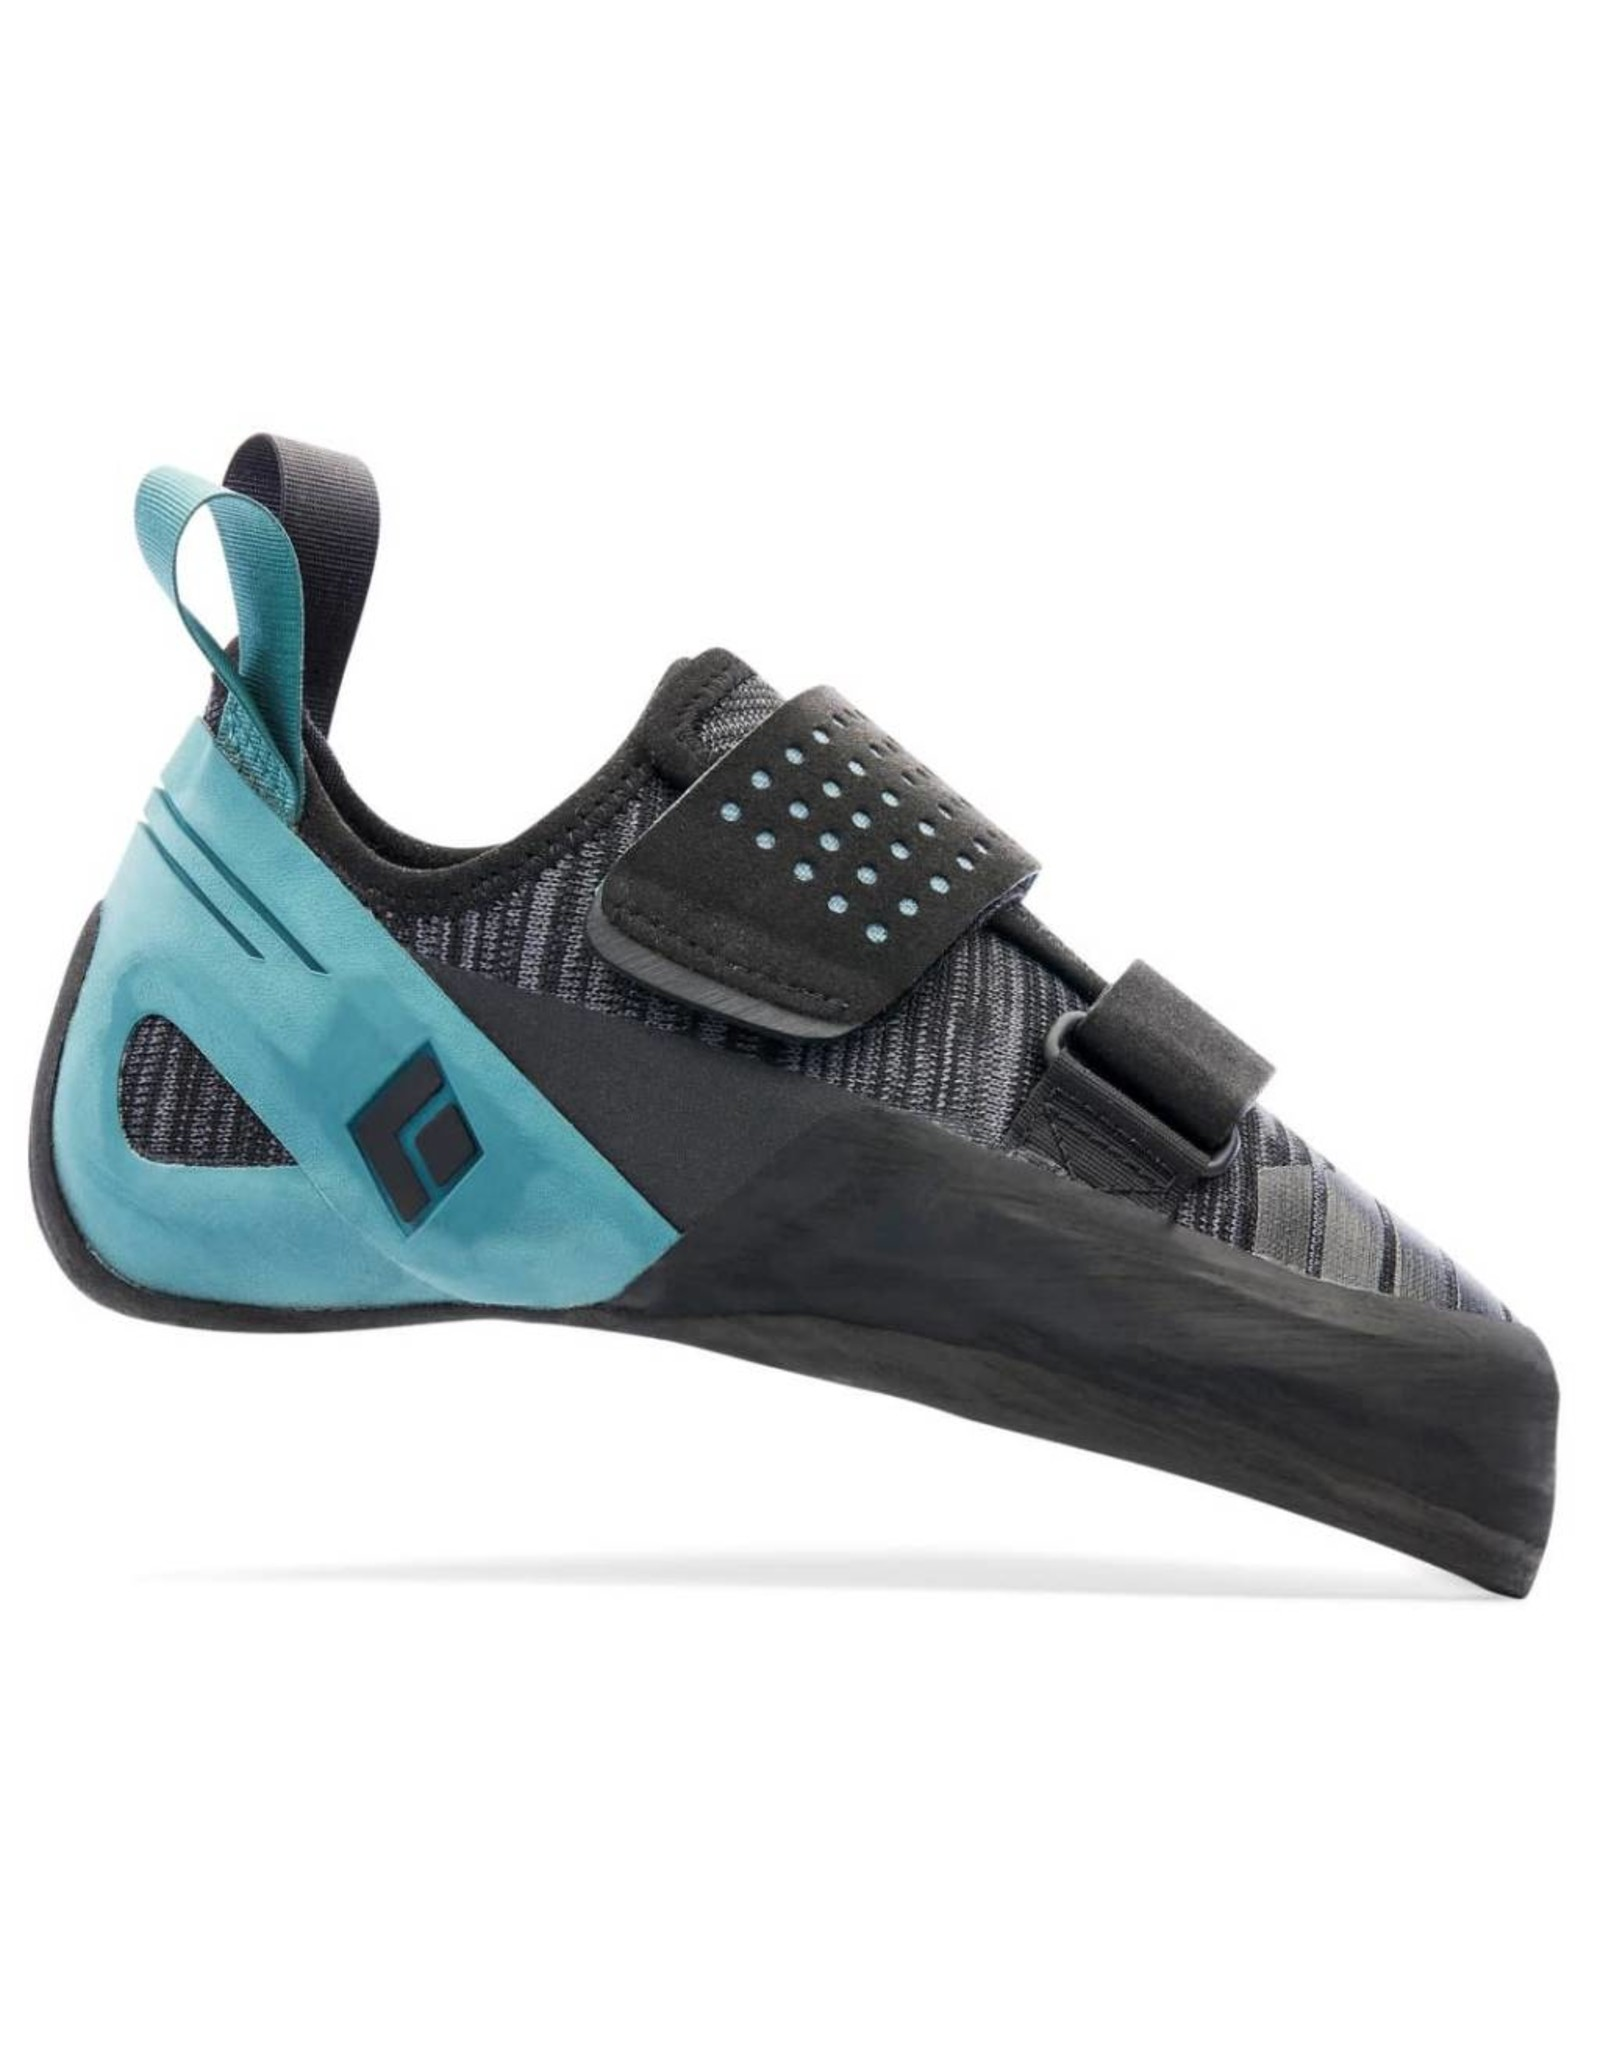 Black Diamond Black Diamond Zone LV Shoes